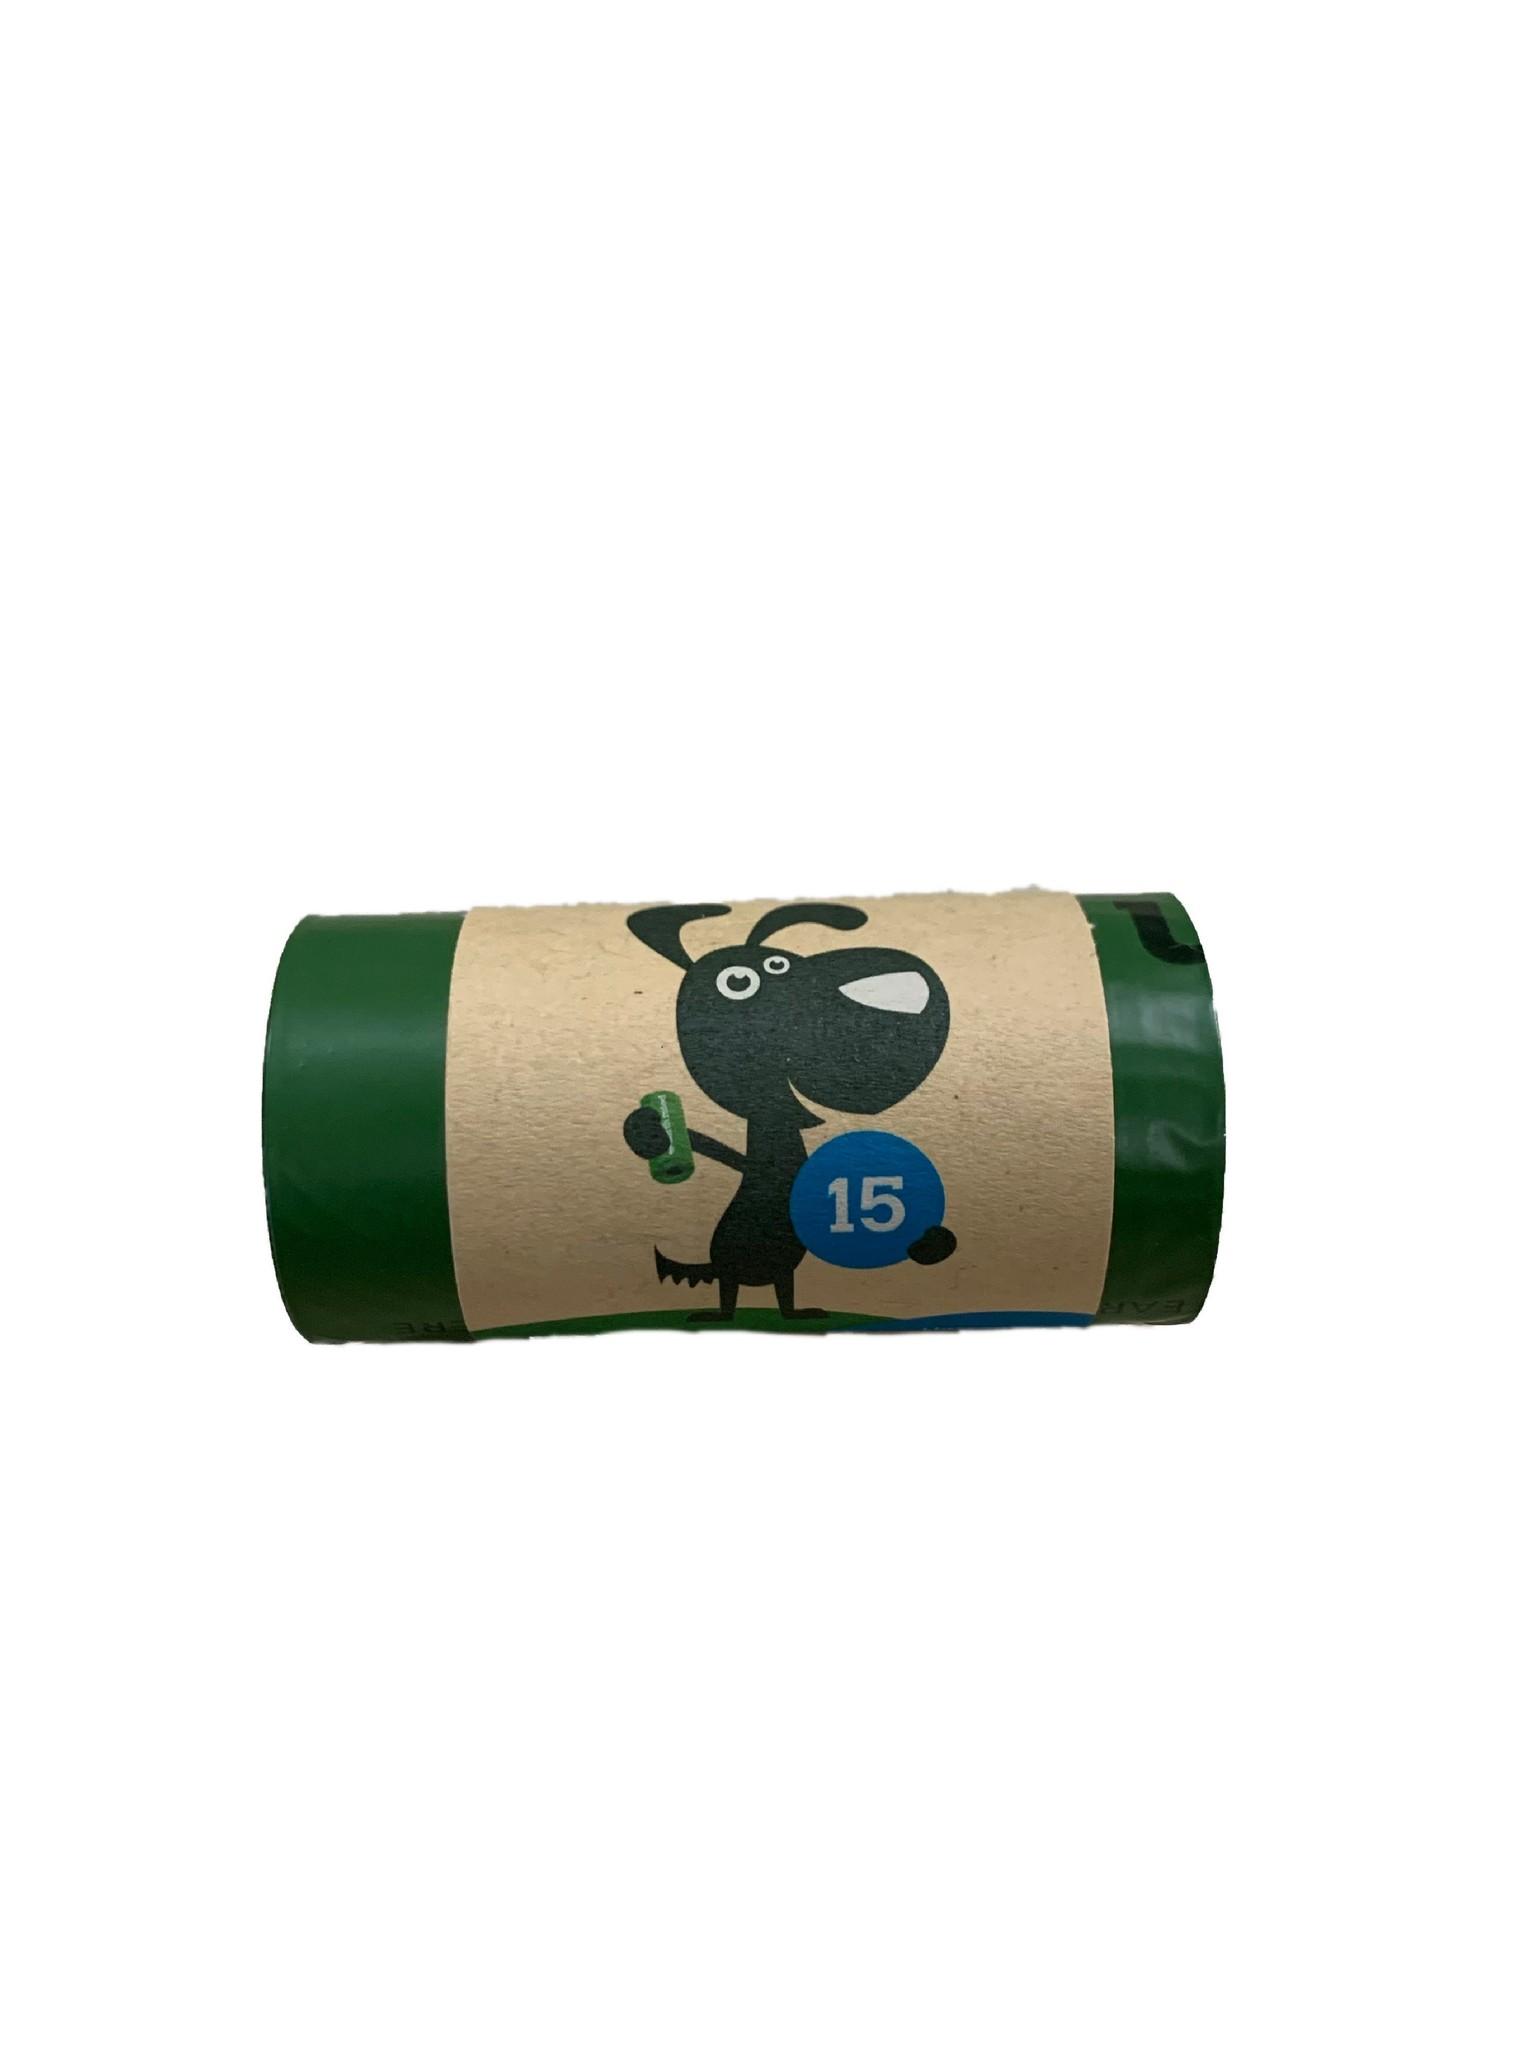 Earth Rated Poop Bags Earth Rated Poop Bags Single Roll Lavender